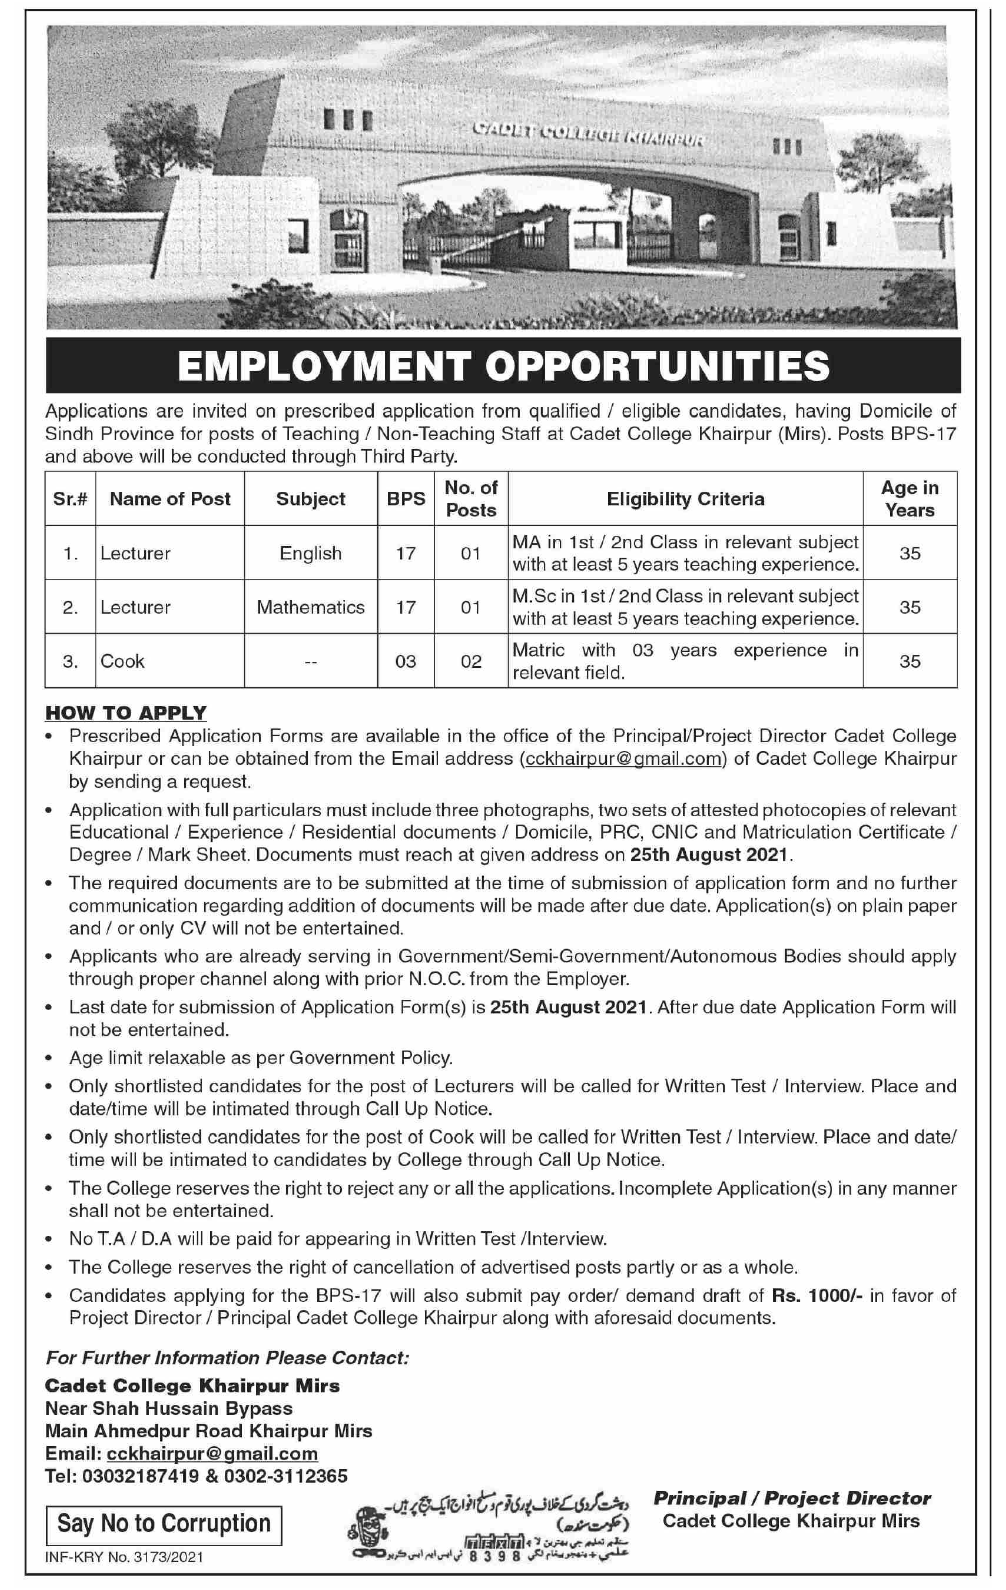 Vacancies of Teaching & Non-Teaching Jobs in Cadet College Khanpur 2